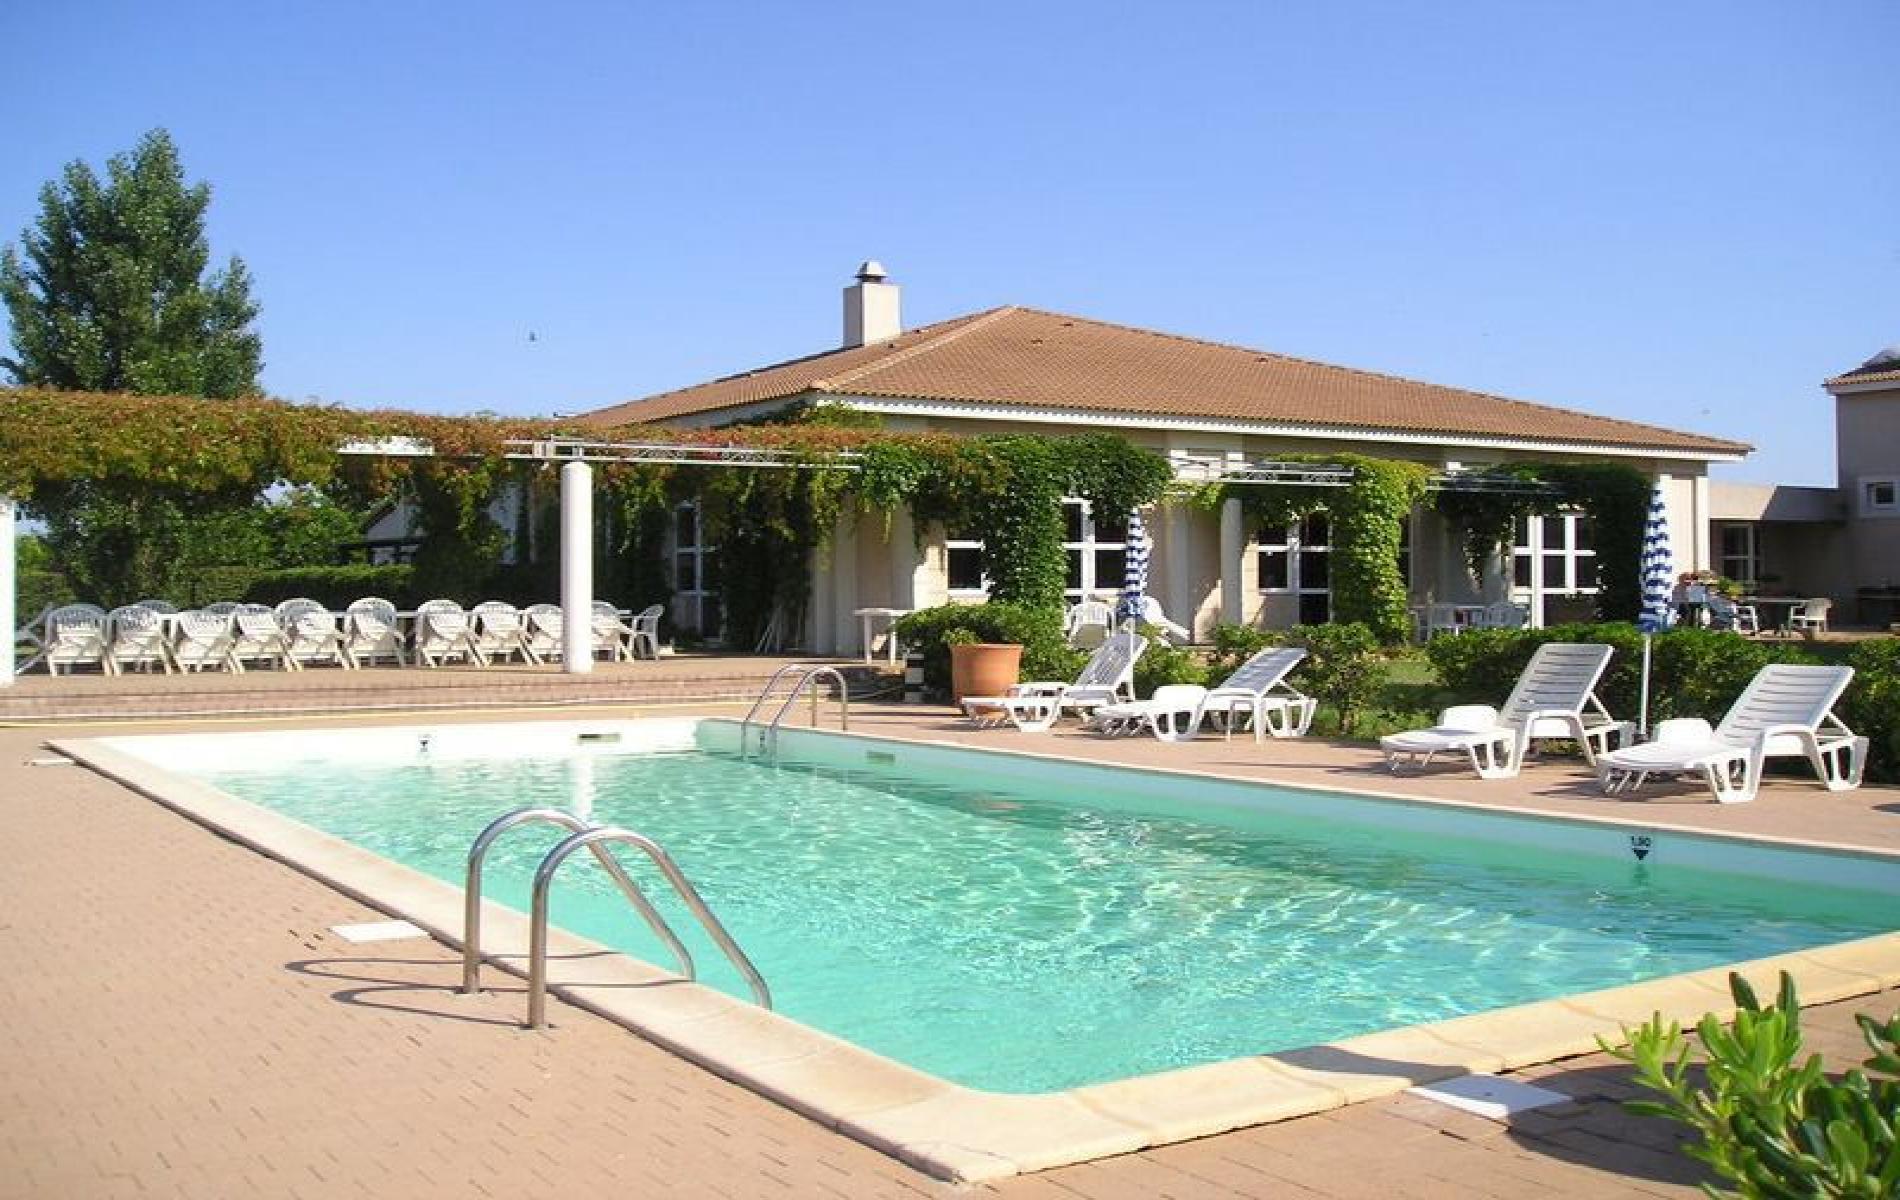 L gant hotel avec piscine dans la chambre for Hotel avec piscine privative